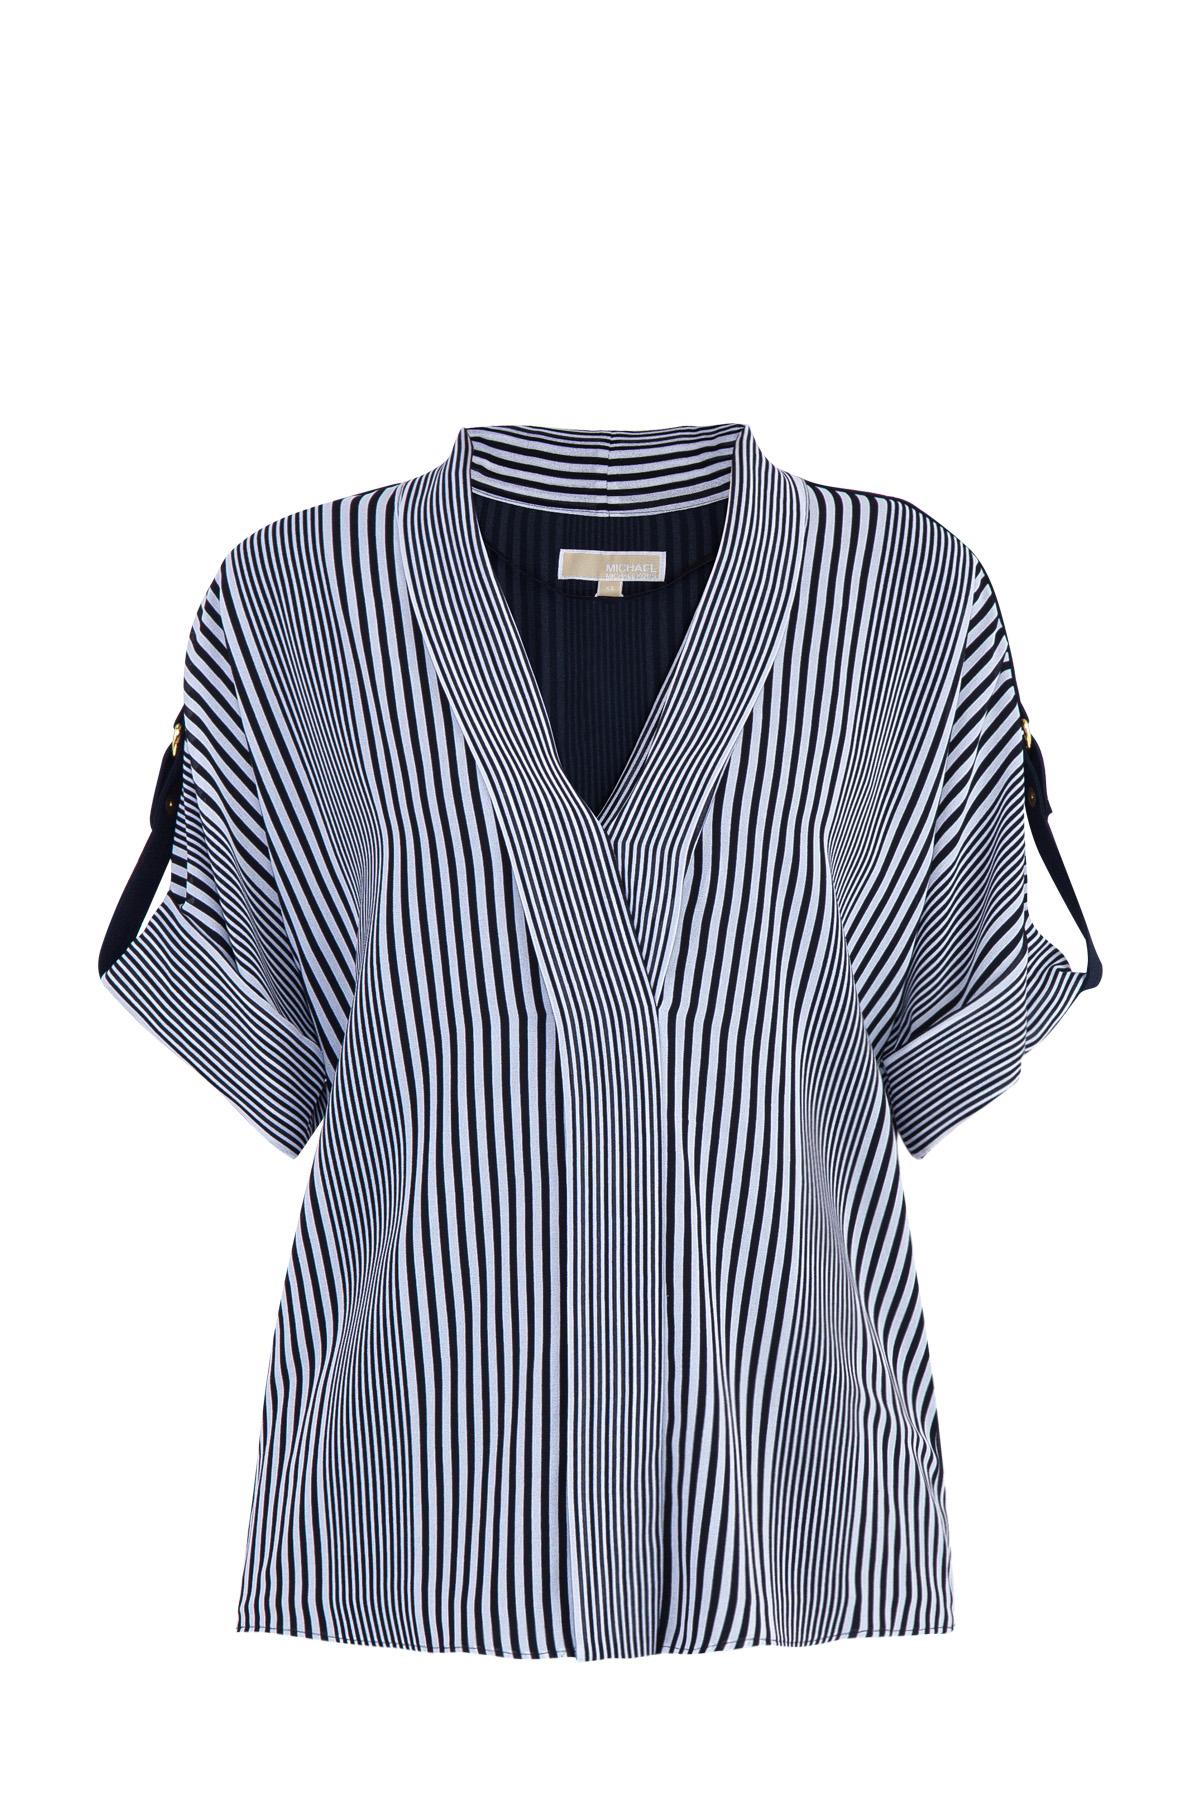 блузкаБлузки, рубашки<br><br>Материал: полиэстер 100%;